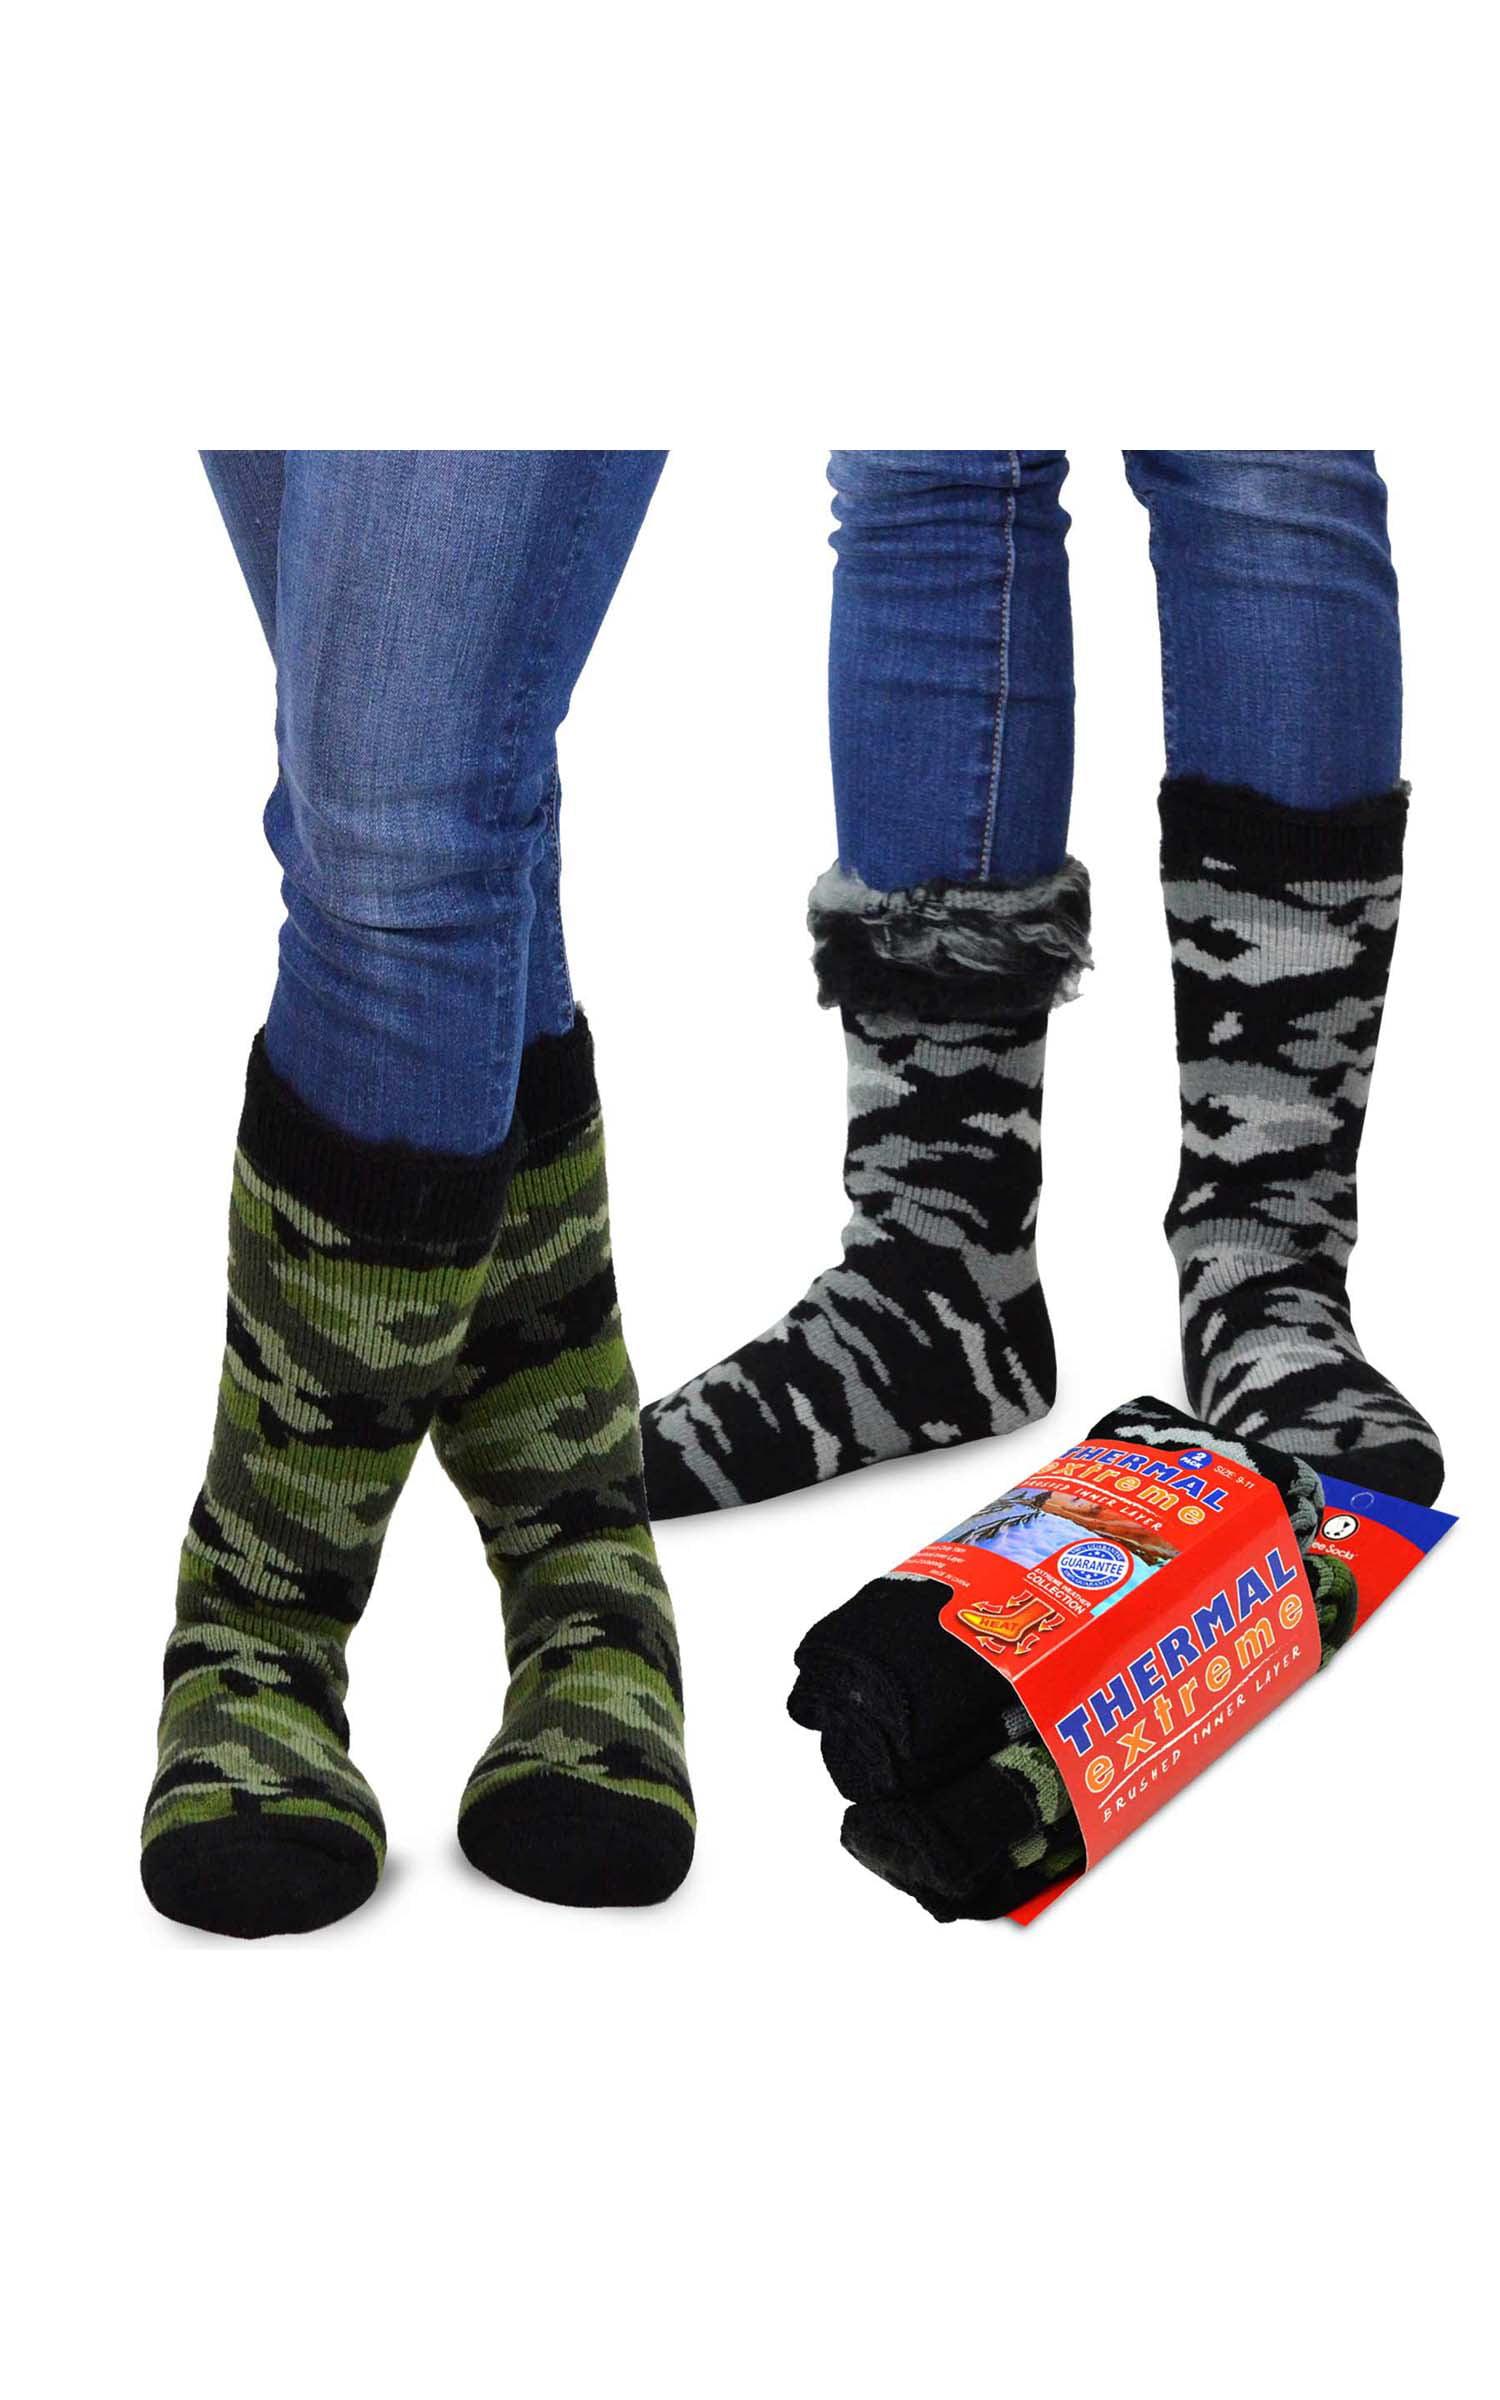 New 6 pack Ladies Women's Winter Warm Brushed Thermal Boot Walking Socks